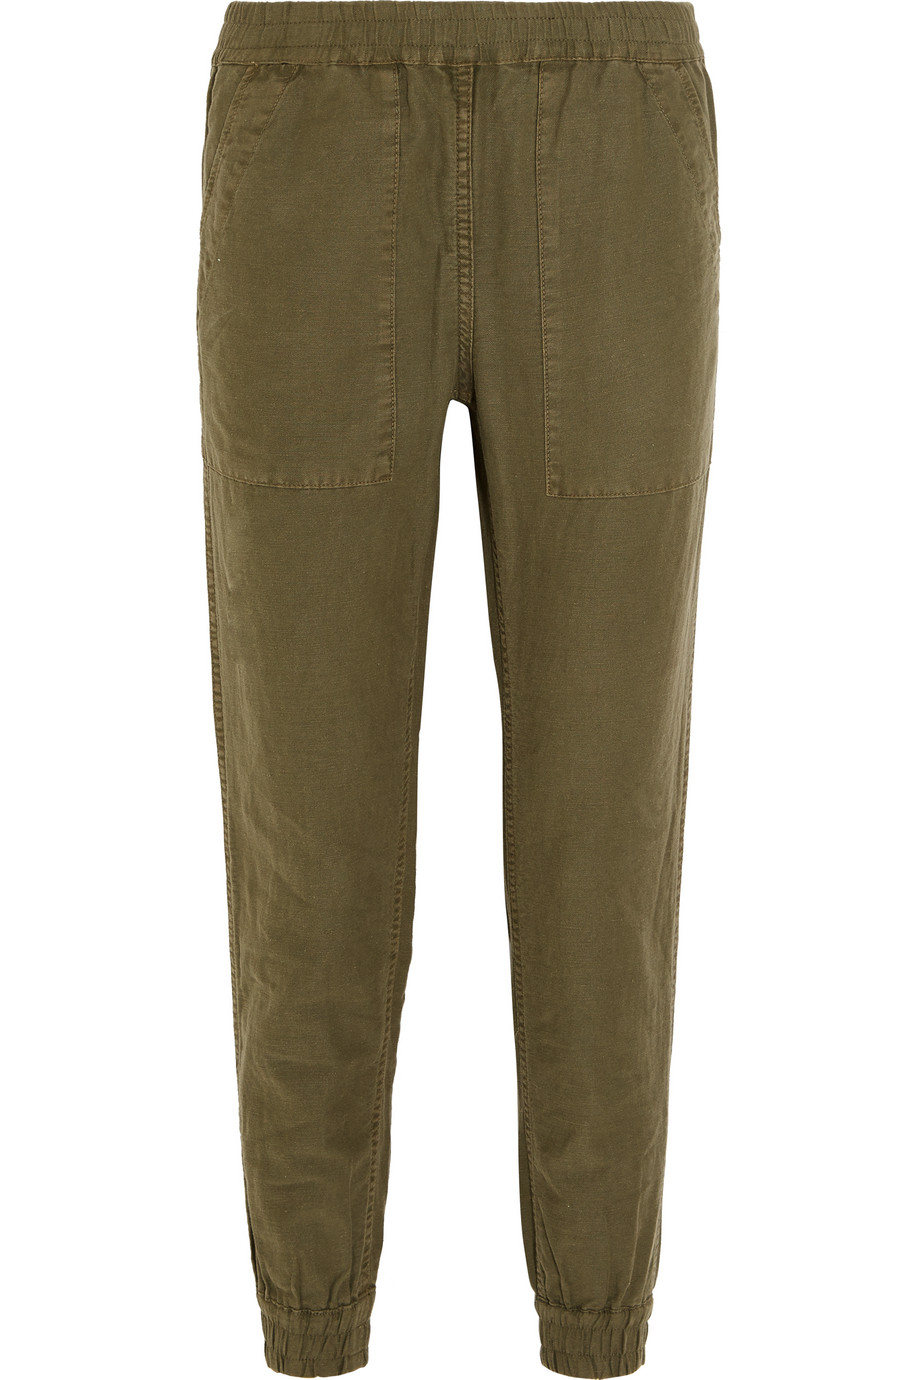 NLST Cotton and Hemp-Blend Track Pants, Army Green, Women's, Size: XS